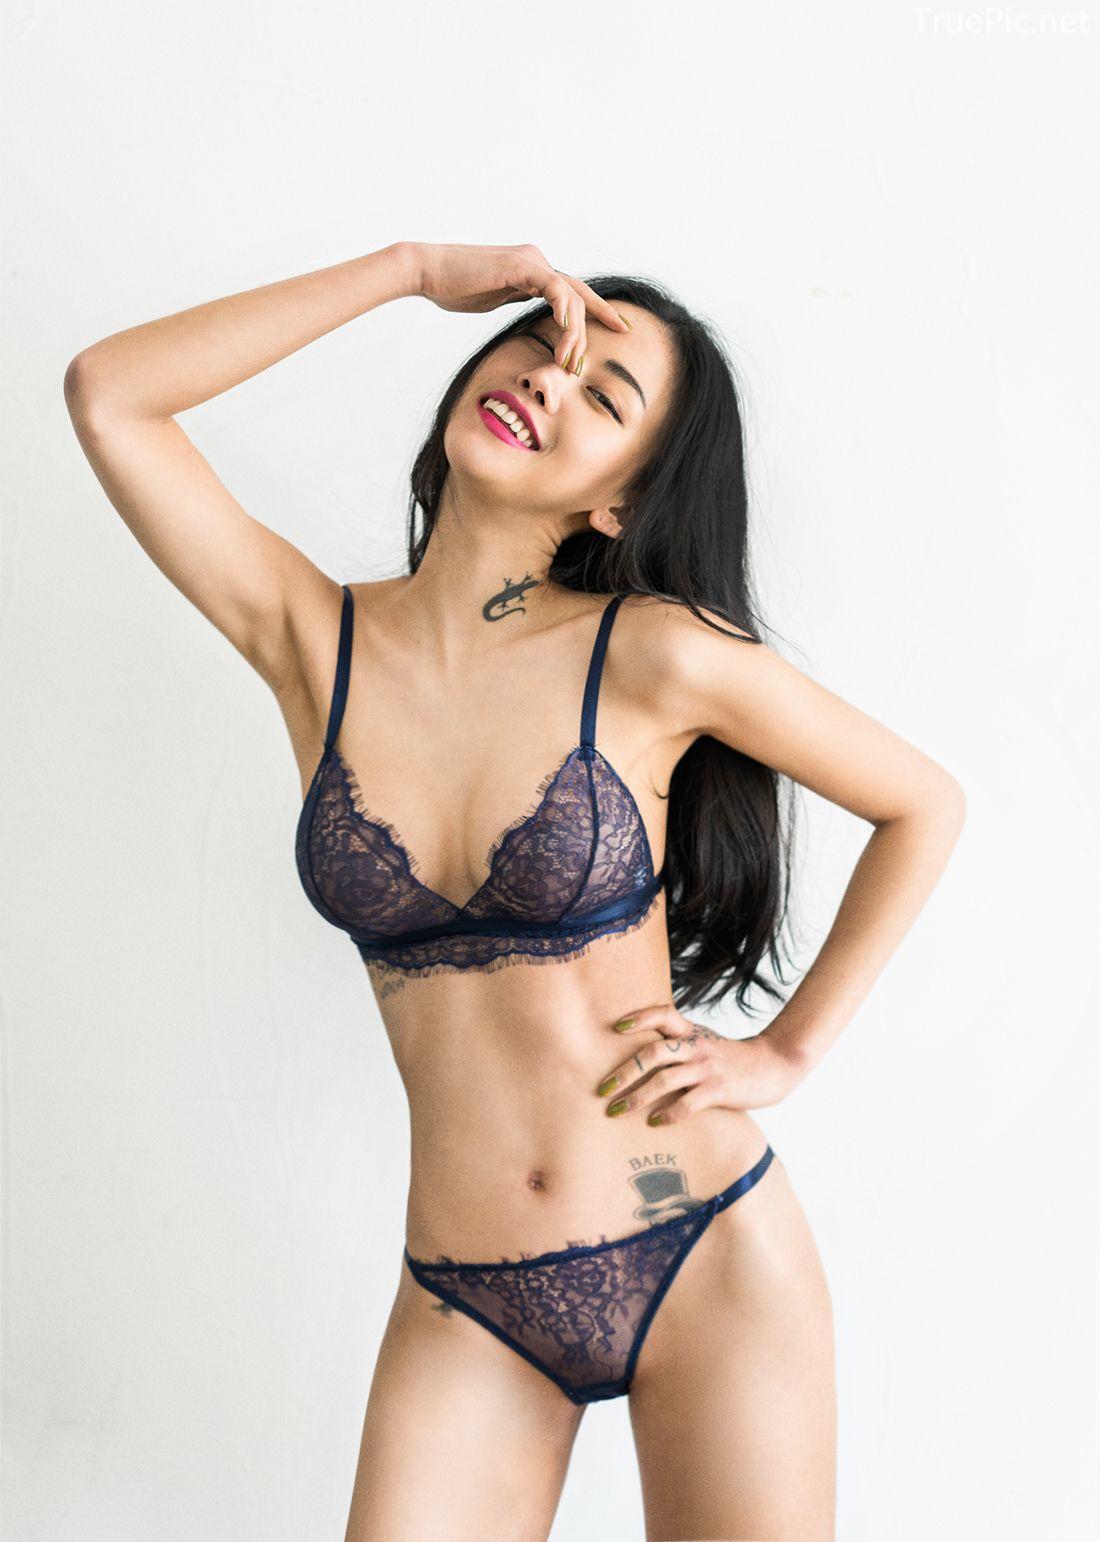 Korean Fashion Model - Baek Ye Jin - Sexy Lingerie Collection - TruePic.net - Picture 6